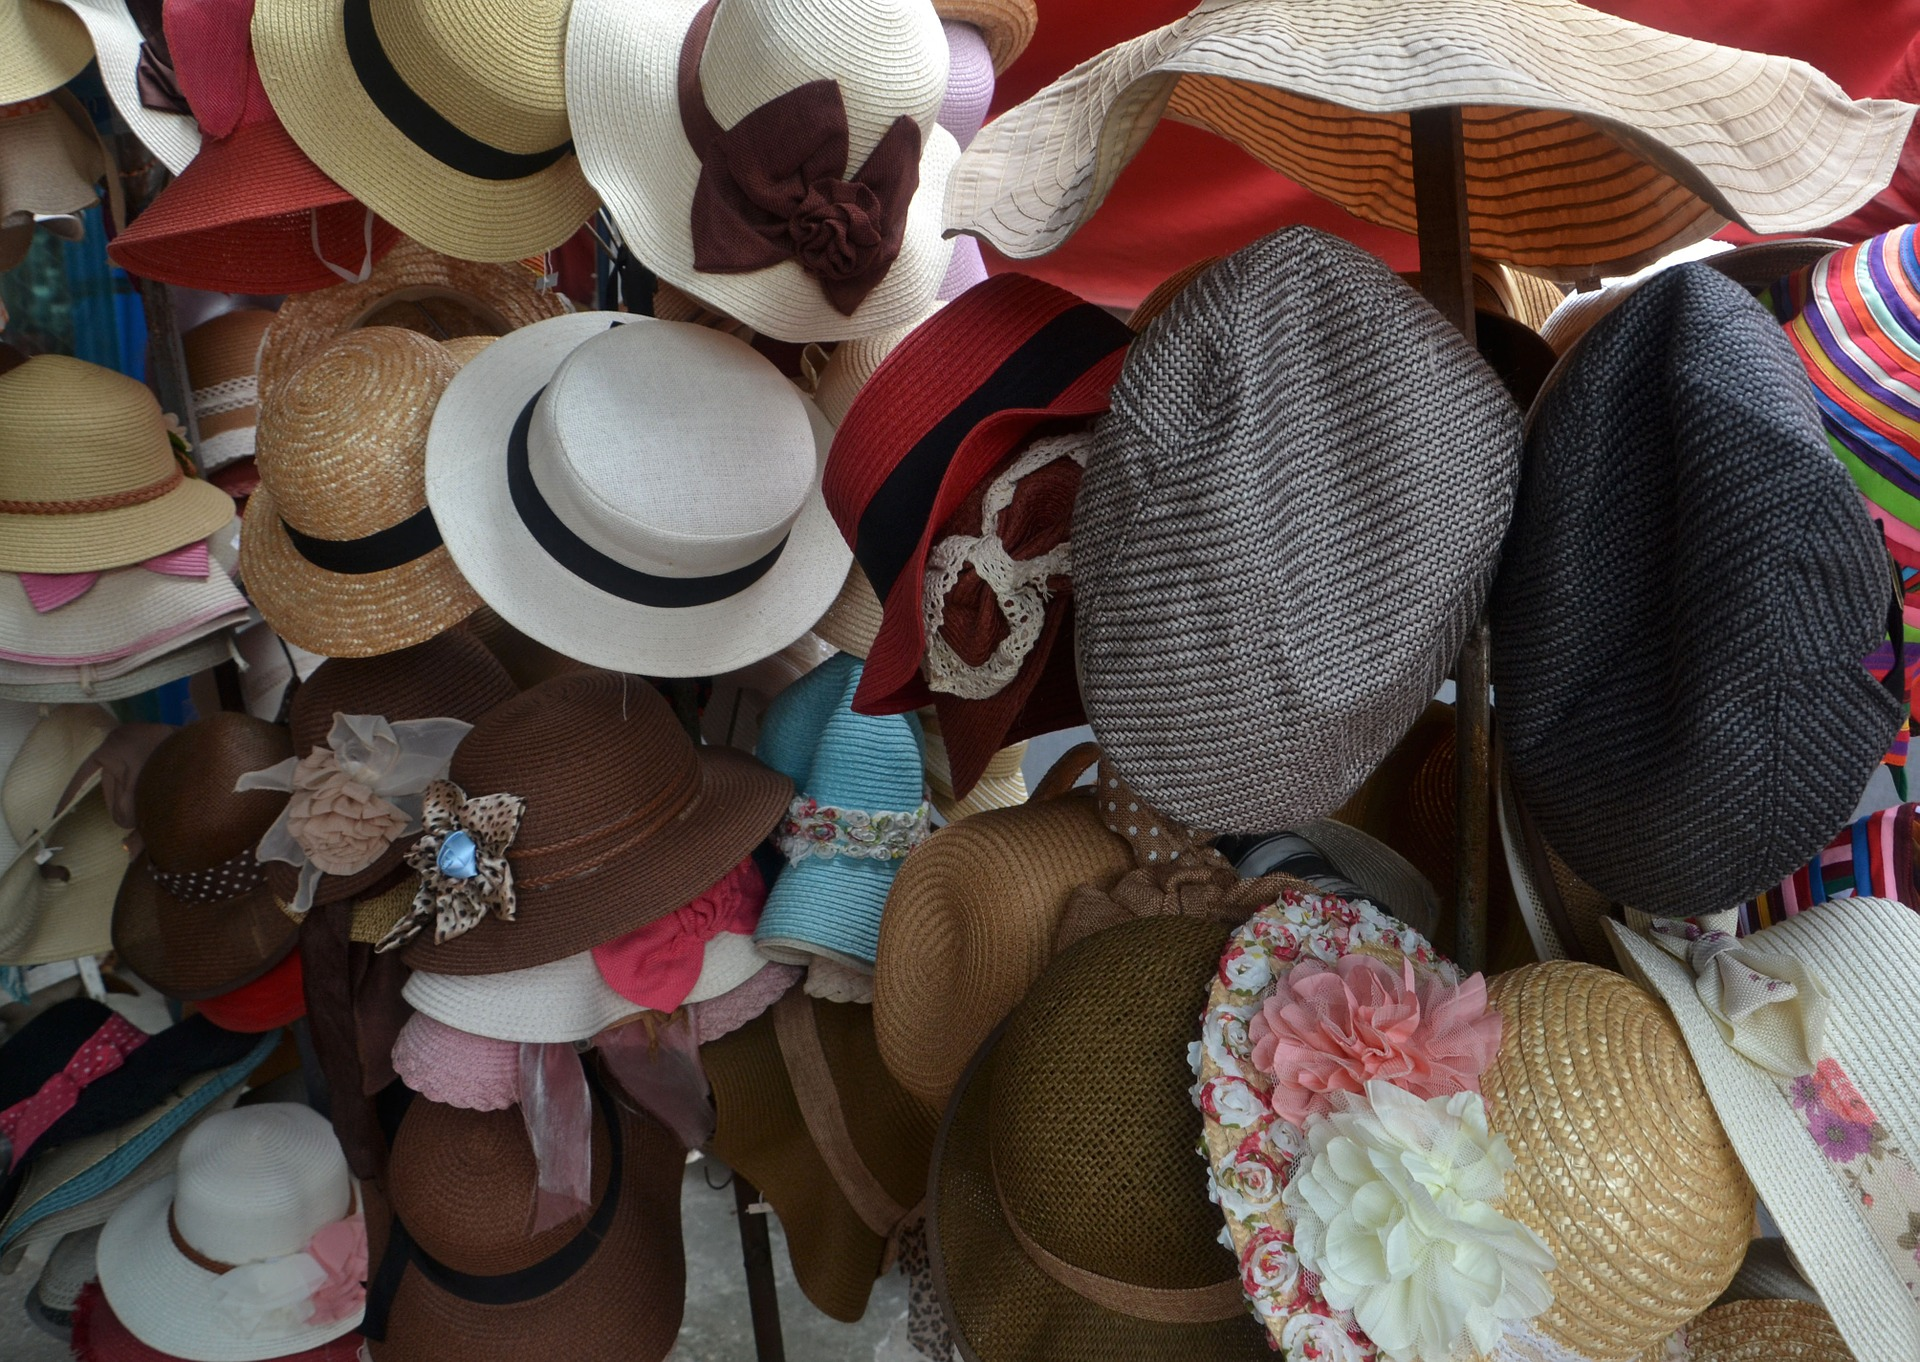 hats-1023709_1920.jpg